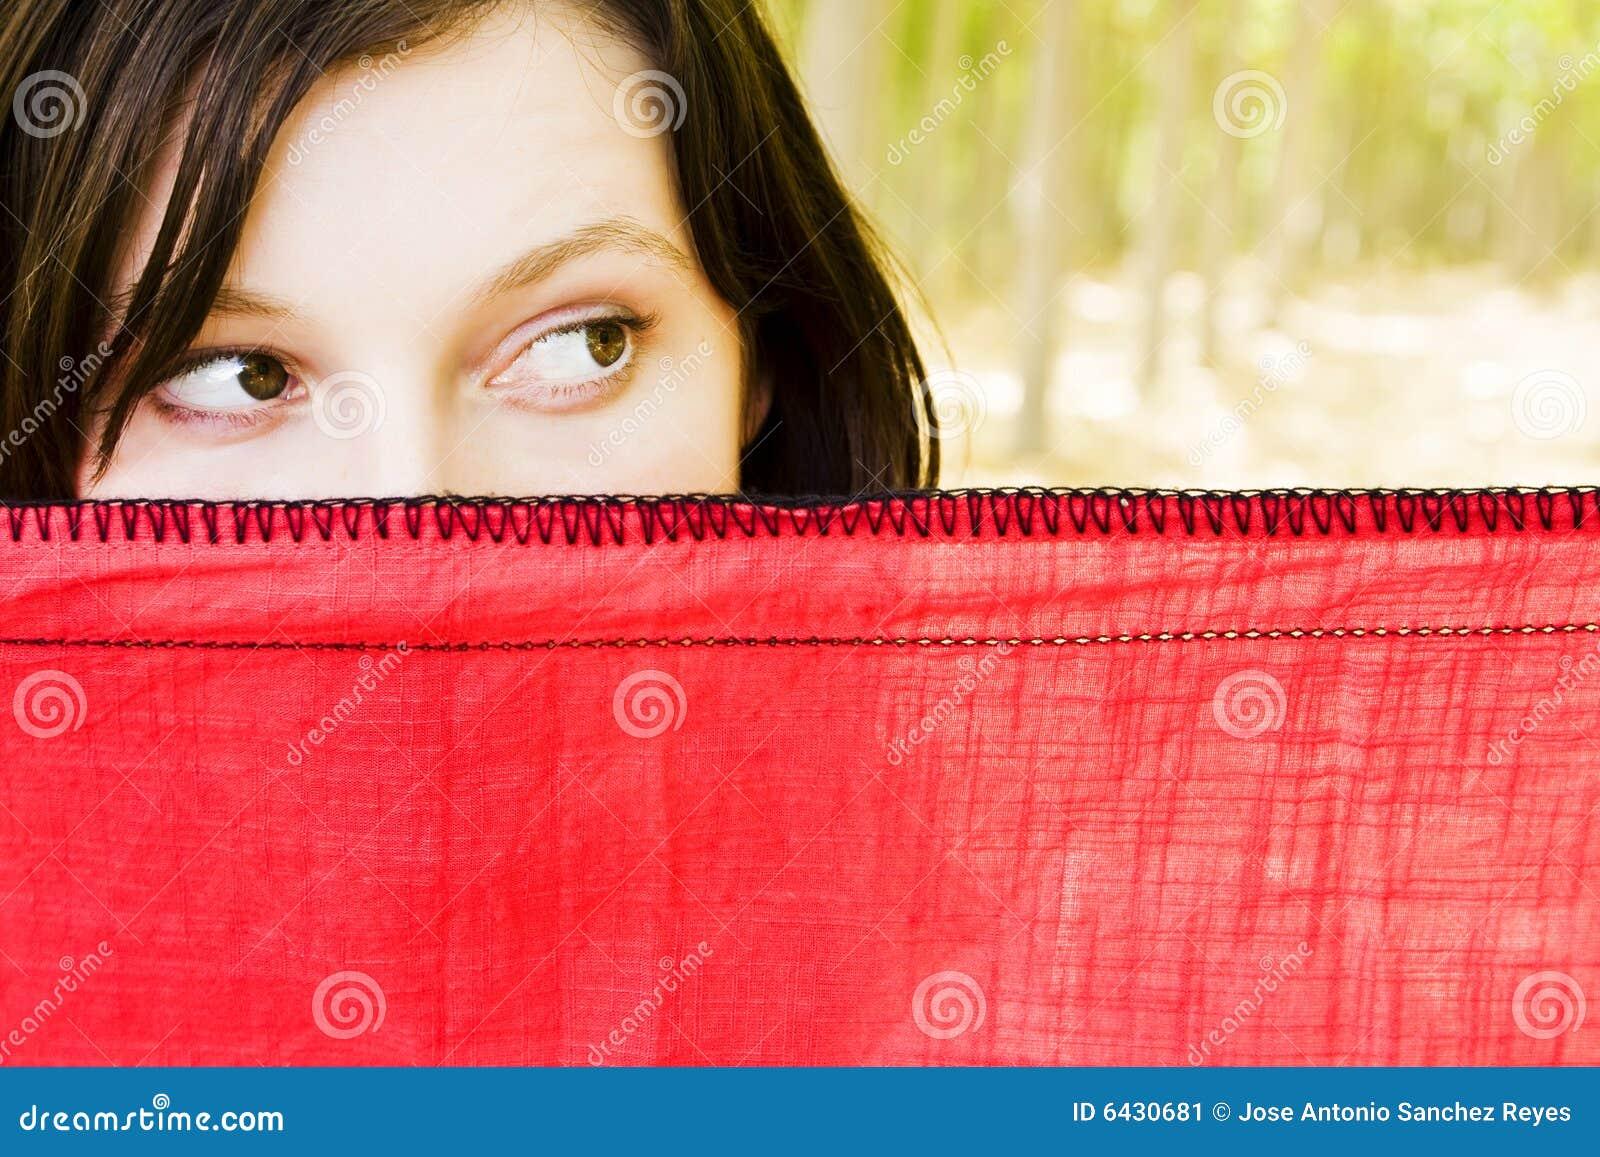 Neugierige Frau hinter Schleier